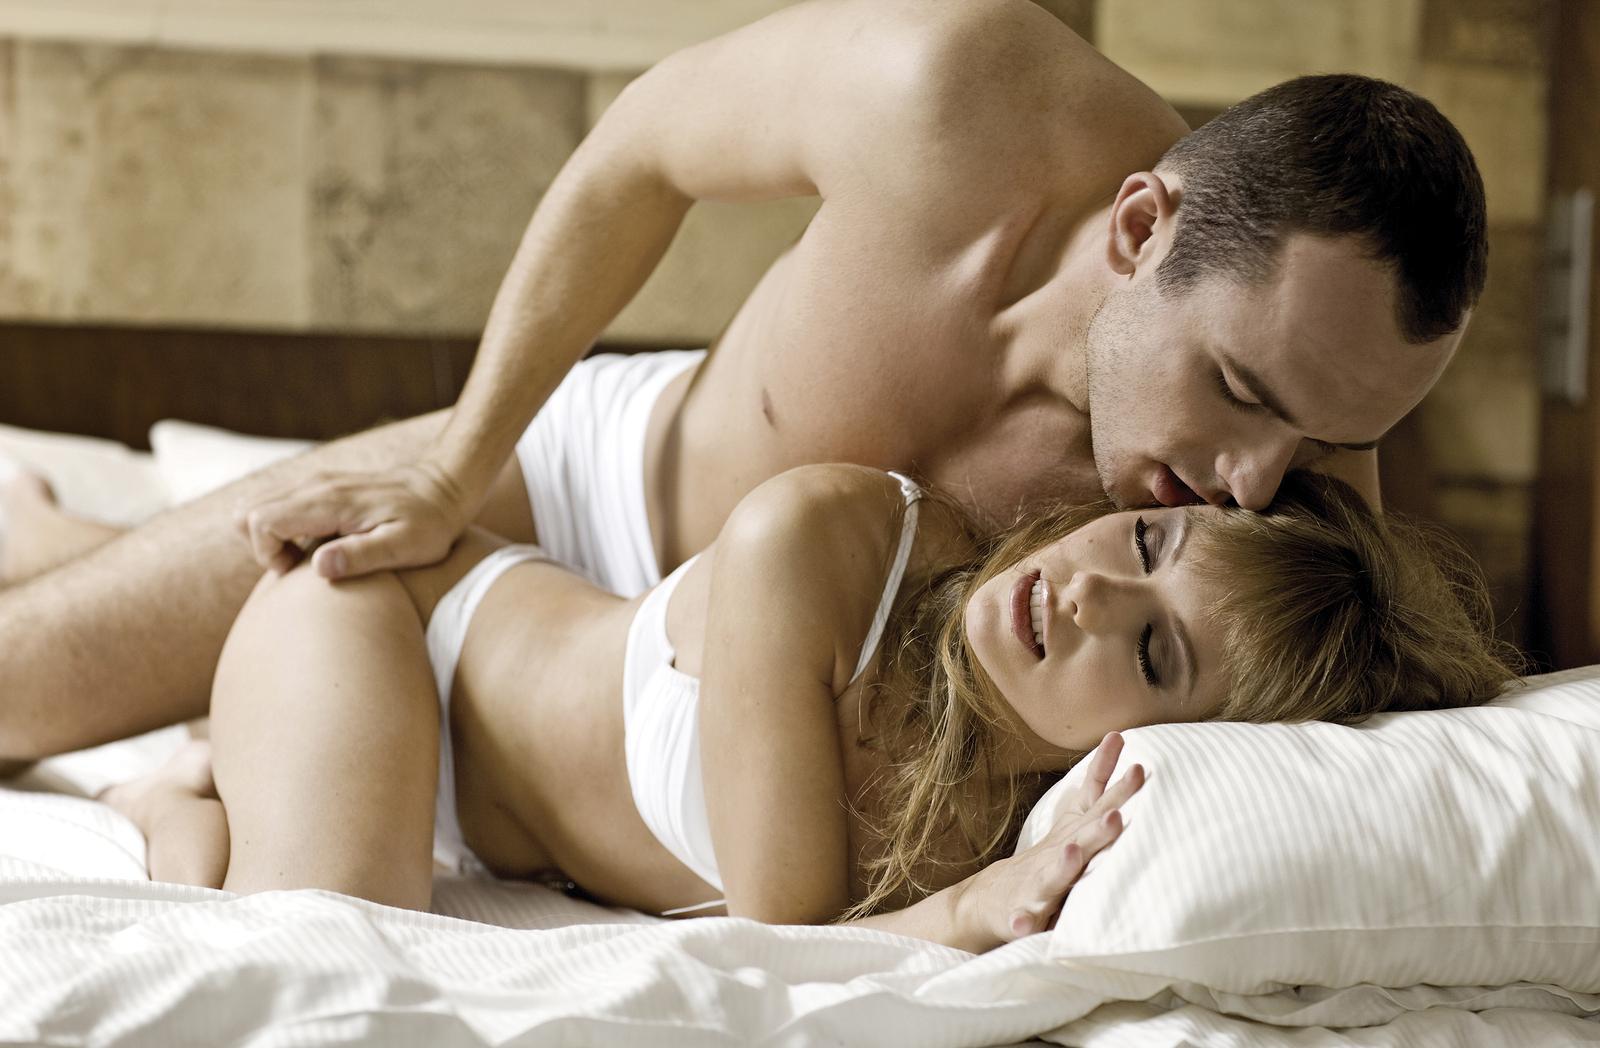 Analni seks velikih guzica